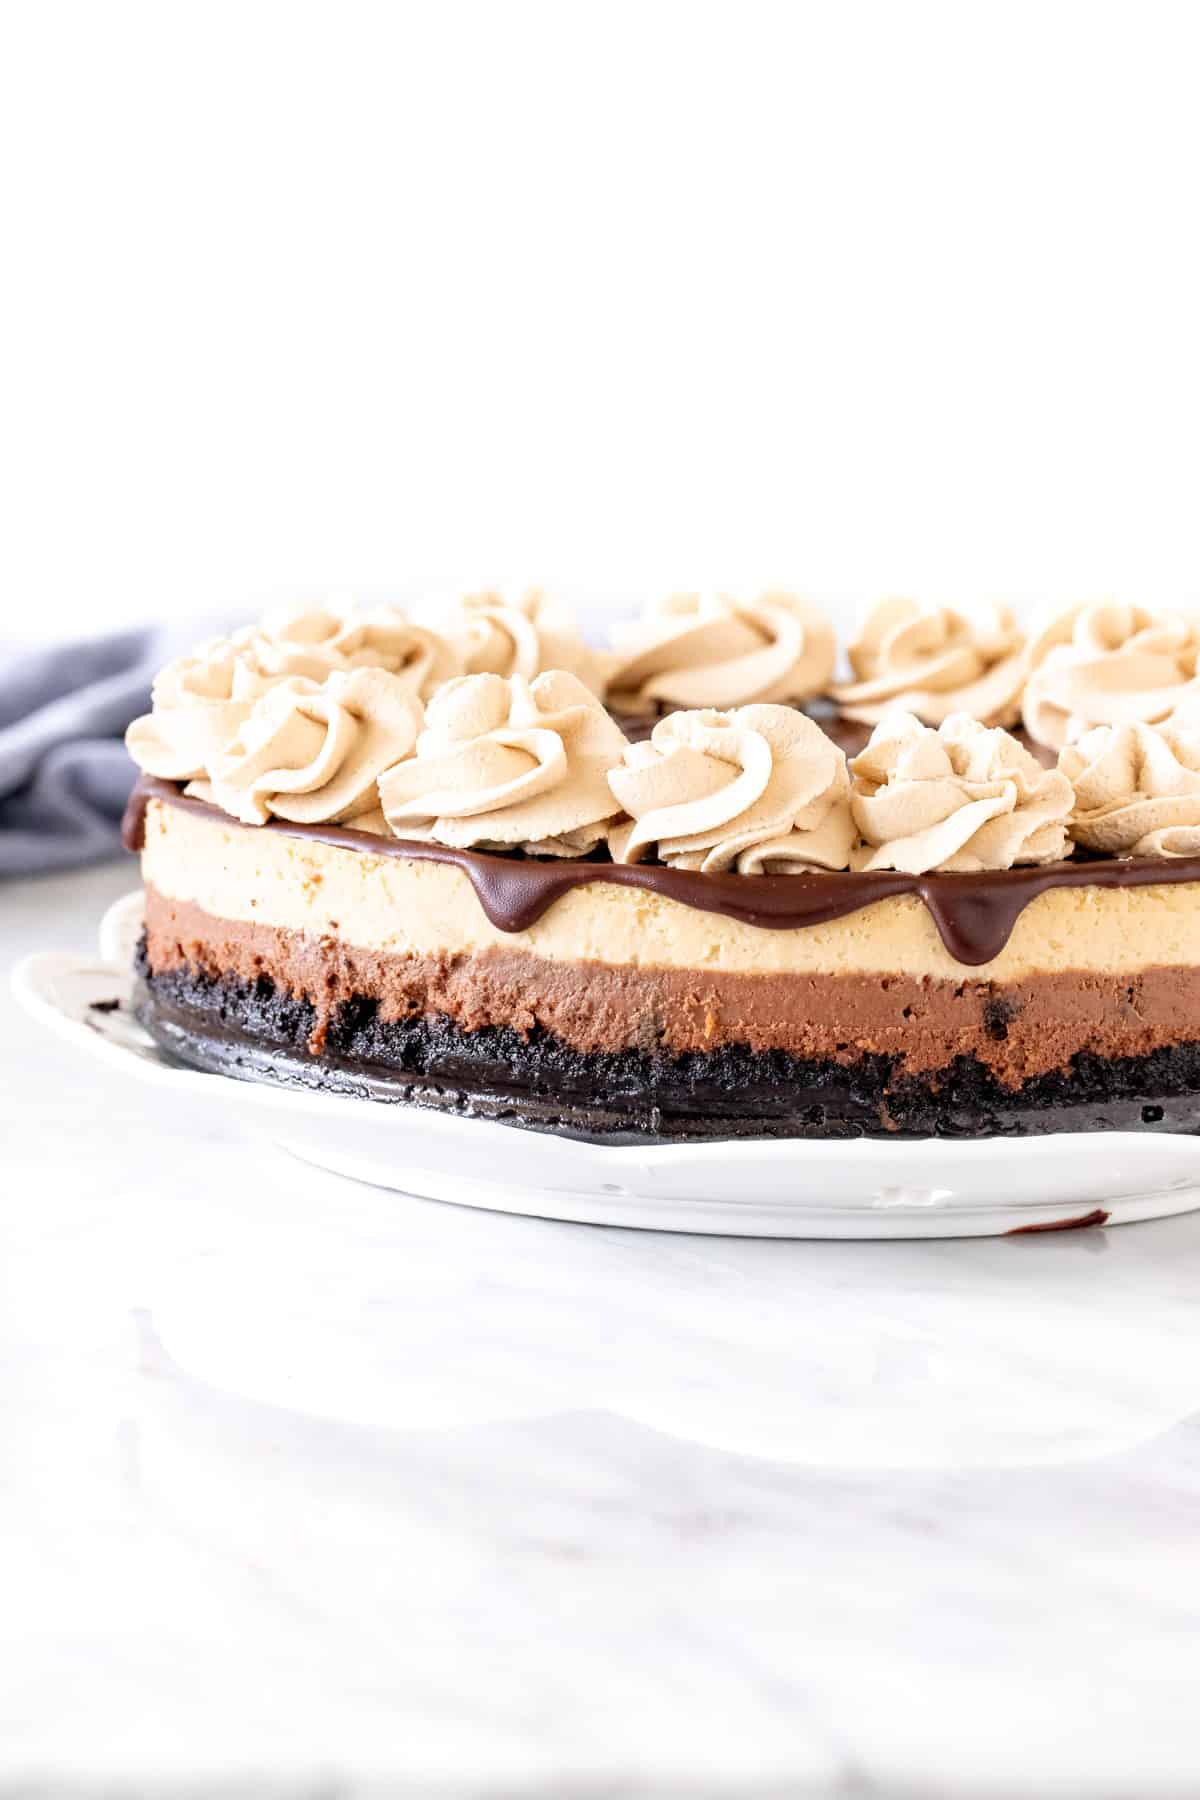 Layered mocha cheesecake with Oreo crust and chocolate on top.